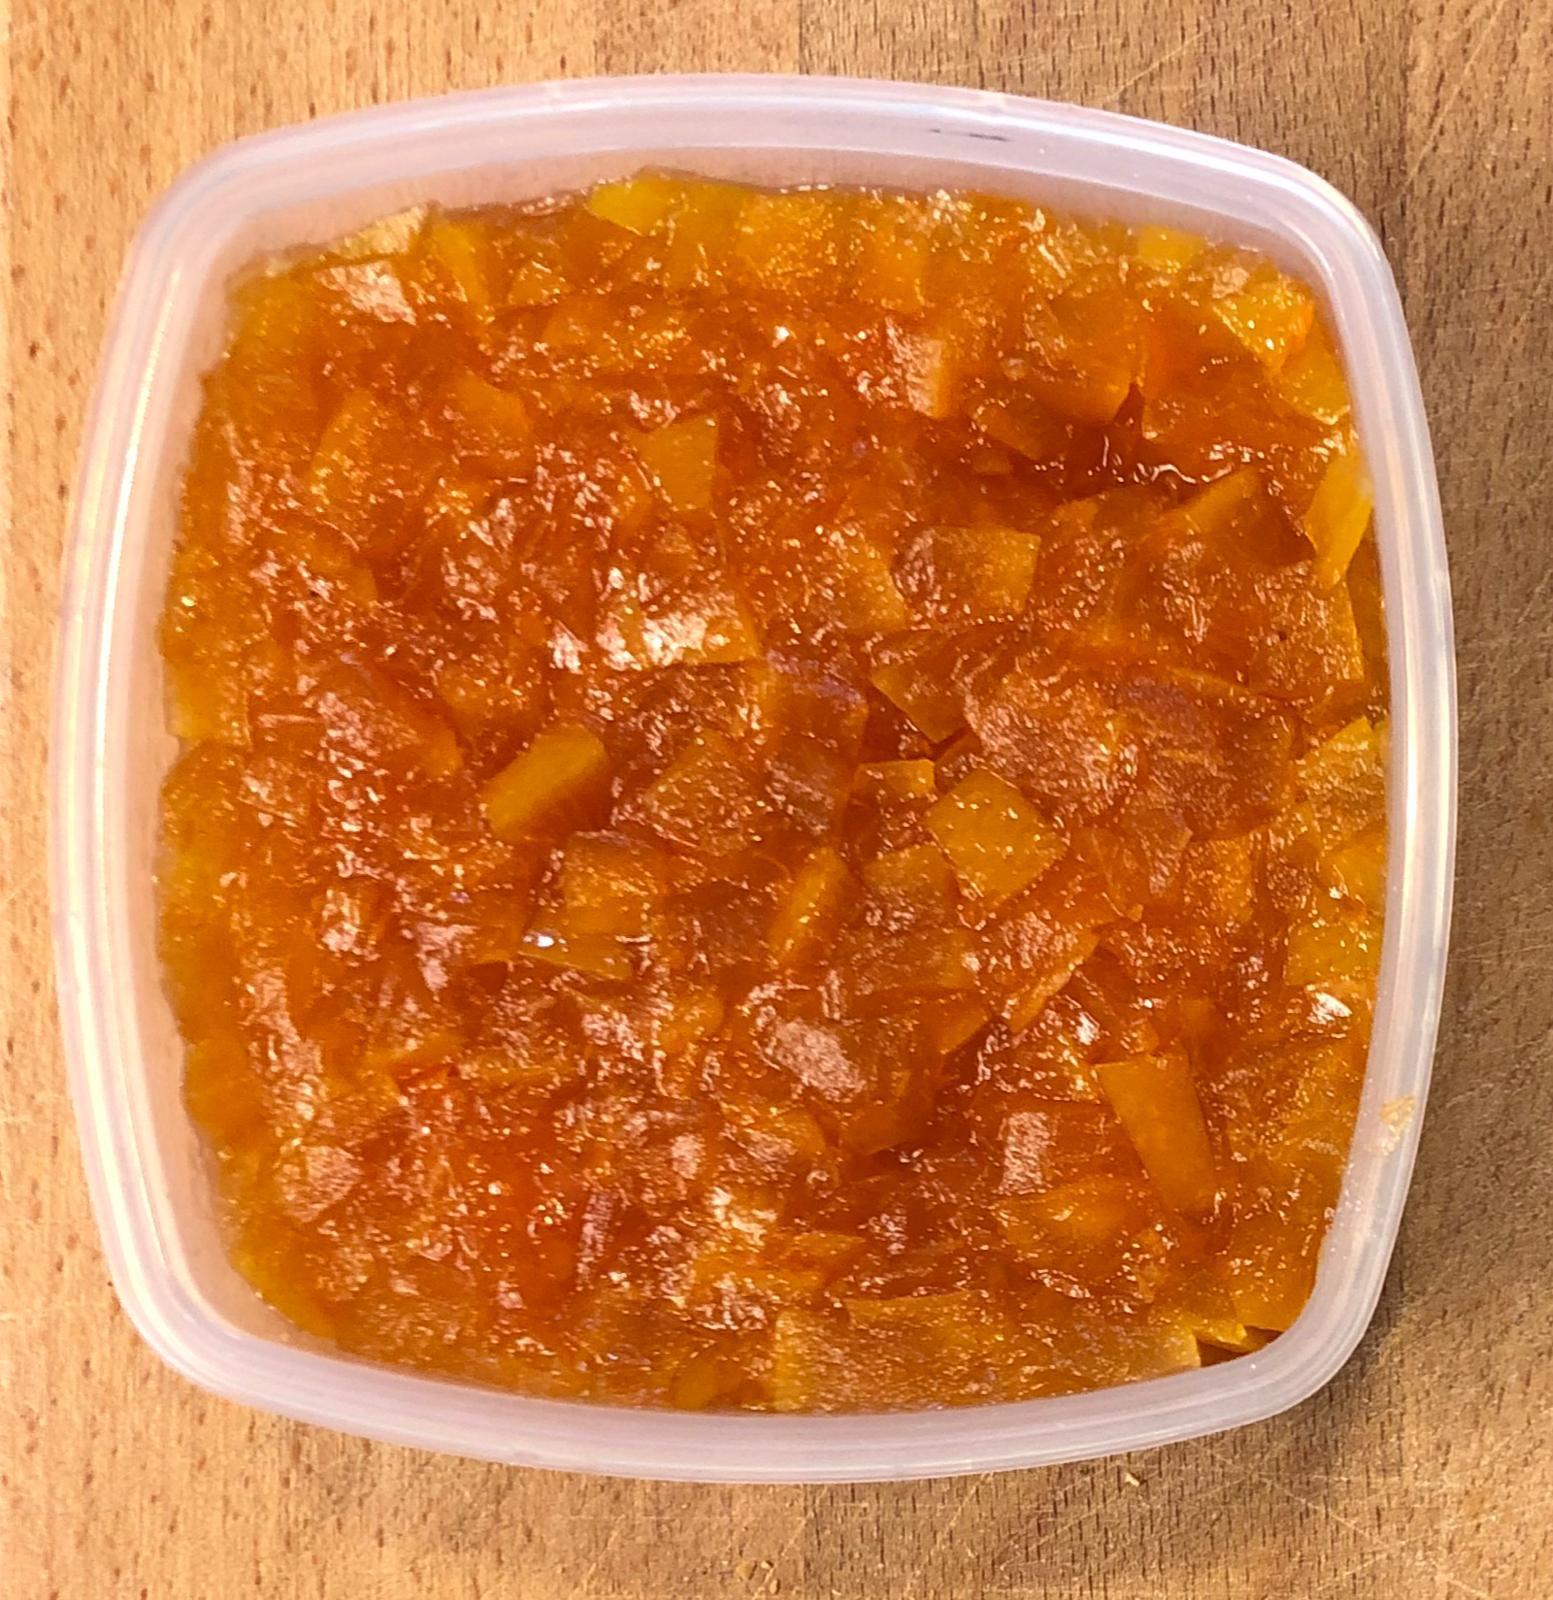 Grapefruit Confit, a recipe by Tom Rees